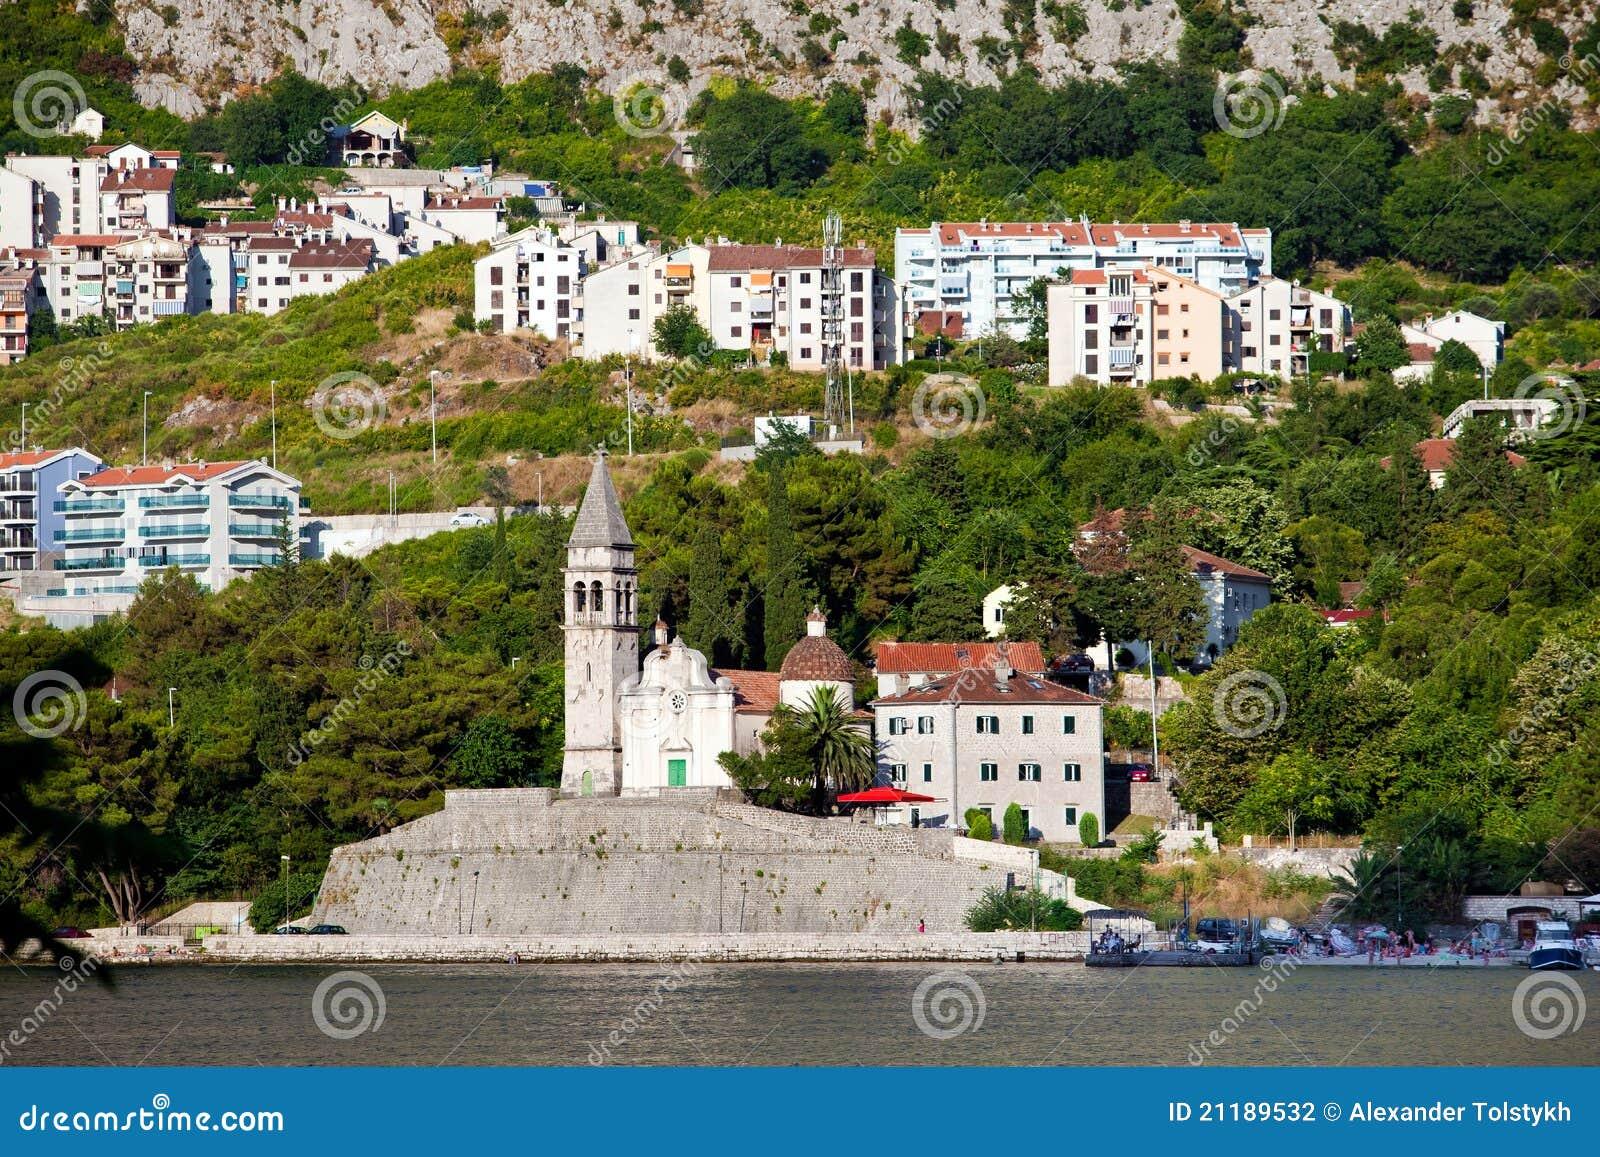 Kotor city view, Montenegro